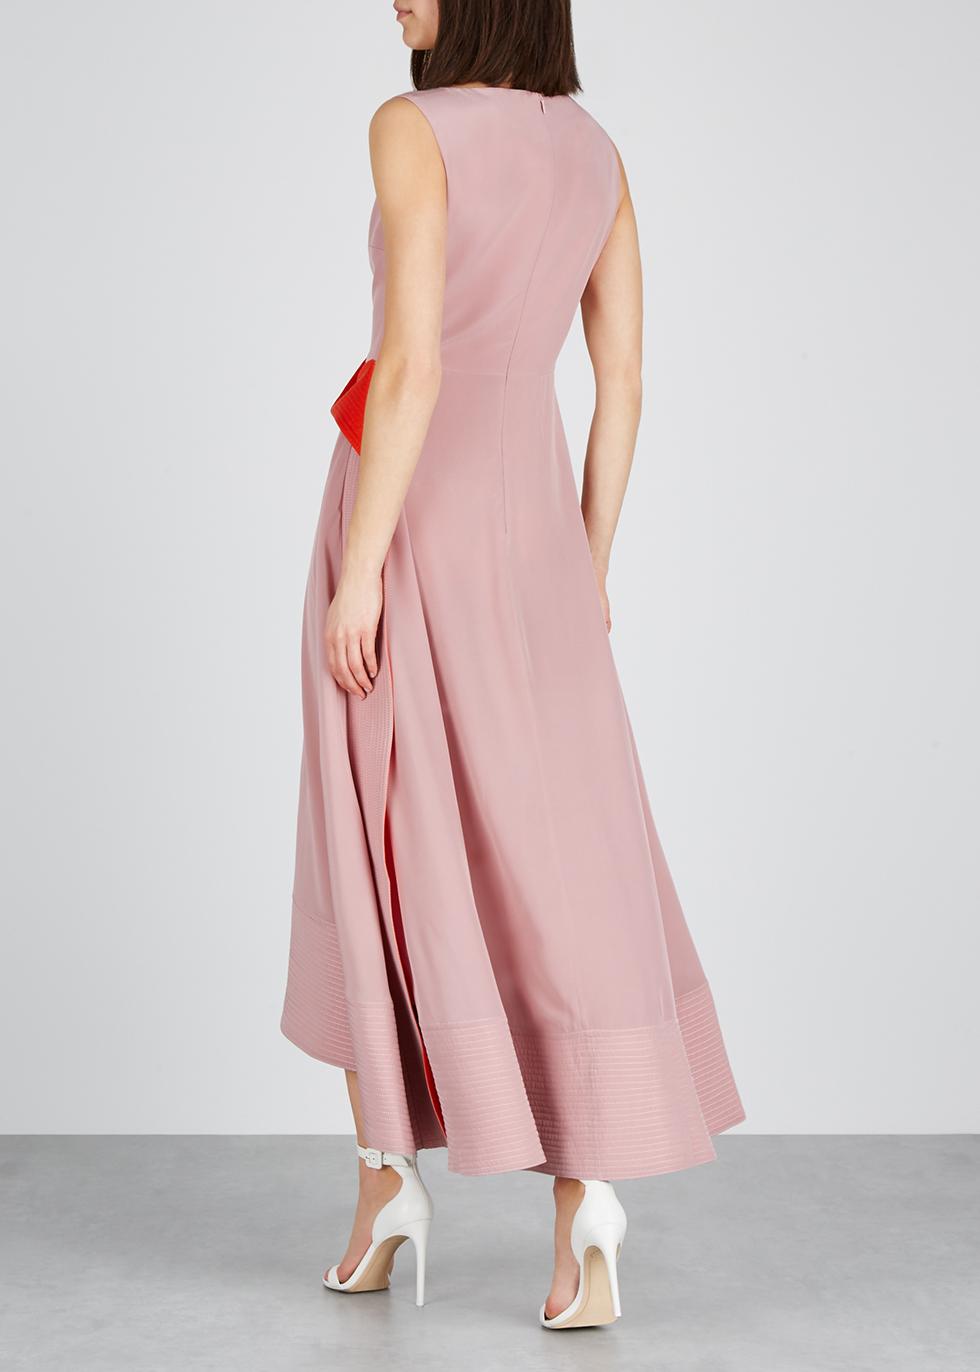 Efilia ruffle-trimmed silk dress - Roksanda